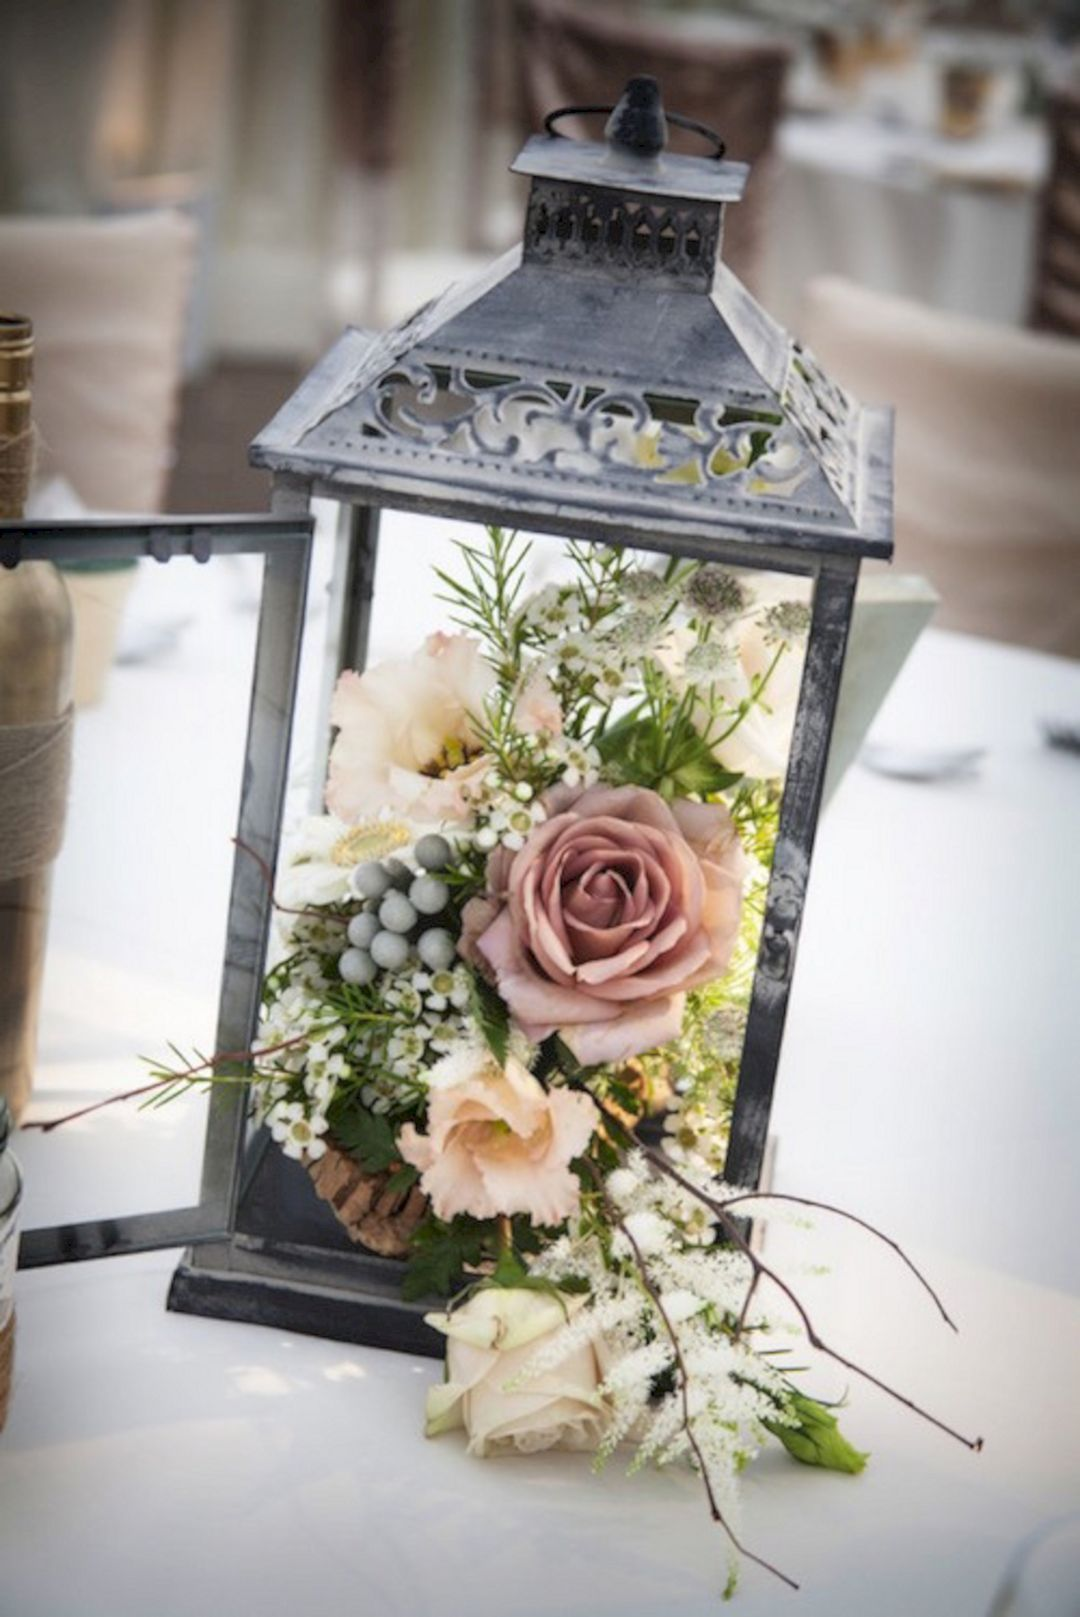 Wedding decoration ideas colors   Dusty Rose Wedding Color Ideas For Most Romantic Wedding  Dusty